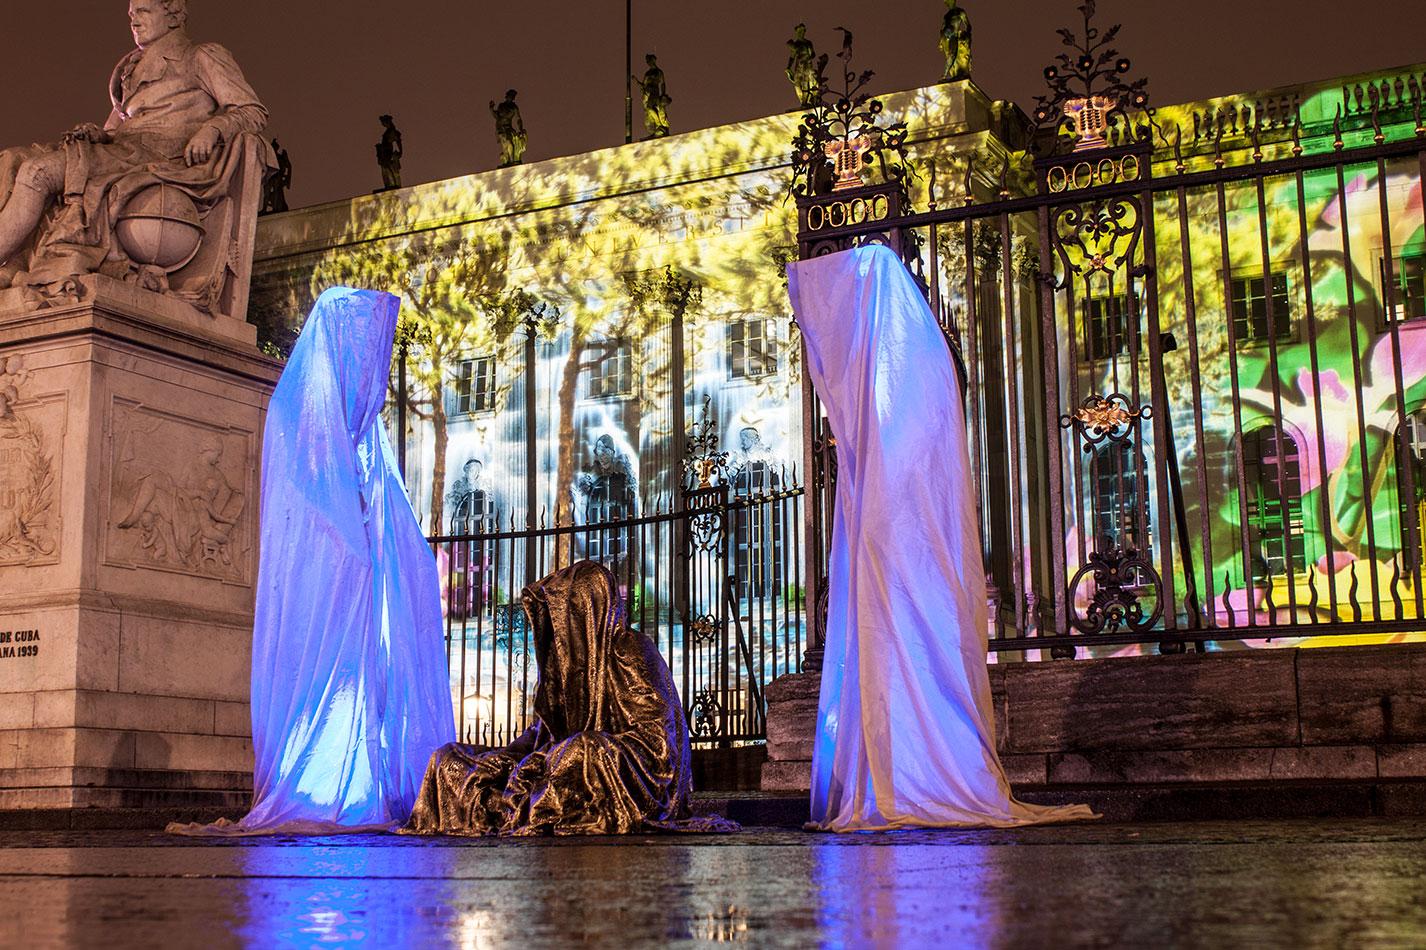 festival-of-lights-berlin-humbold-university-light-art-festival-contemporary-fine-art-design-show-guardiansof-time-manfred-kili-kielnhofer-sculpture-3617